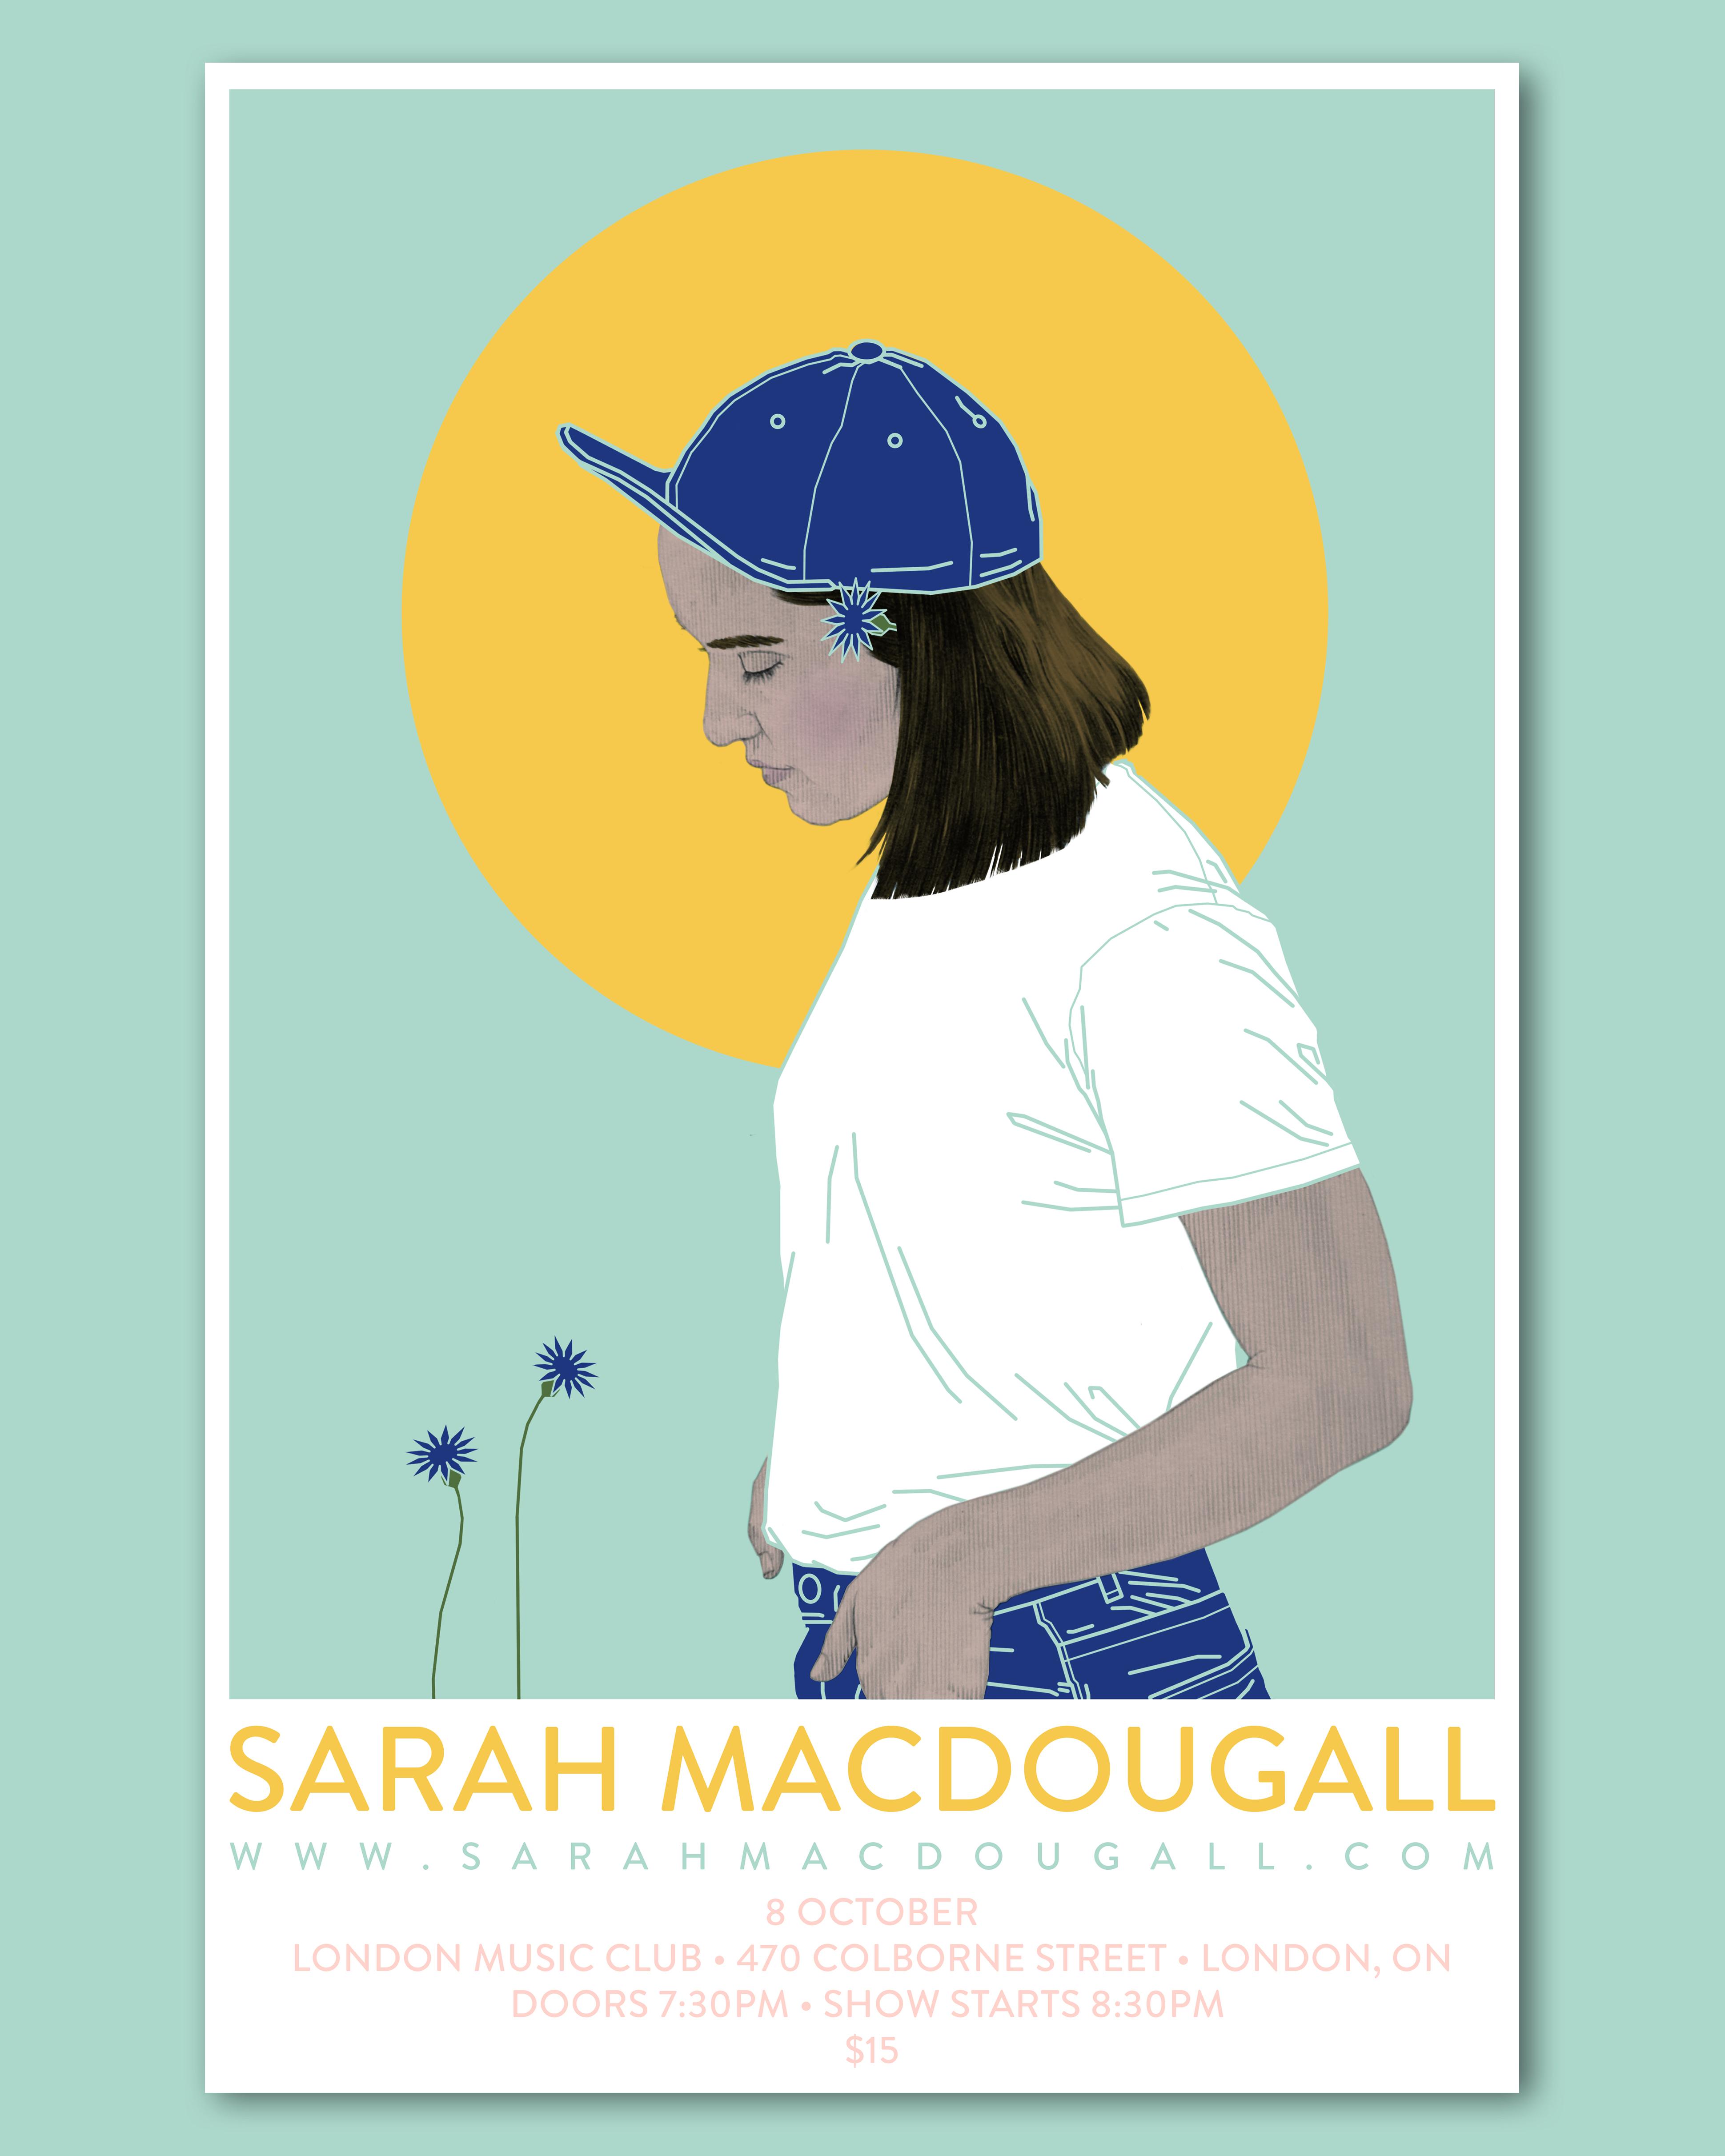 Sarah MacDougall Concert Poster(Instagram4)